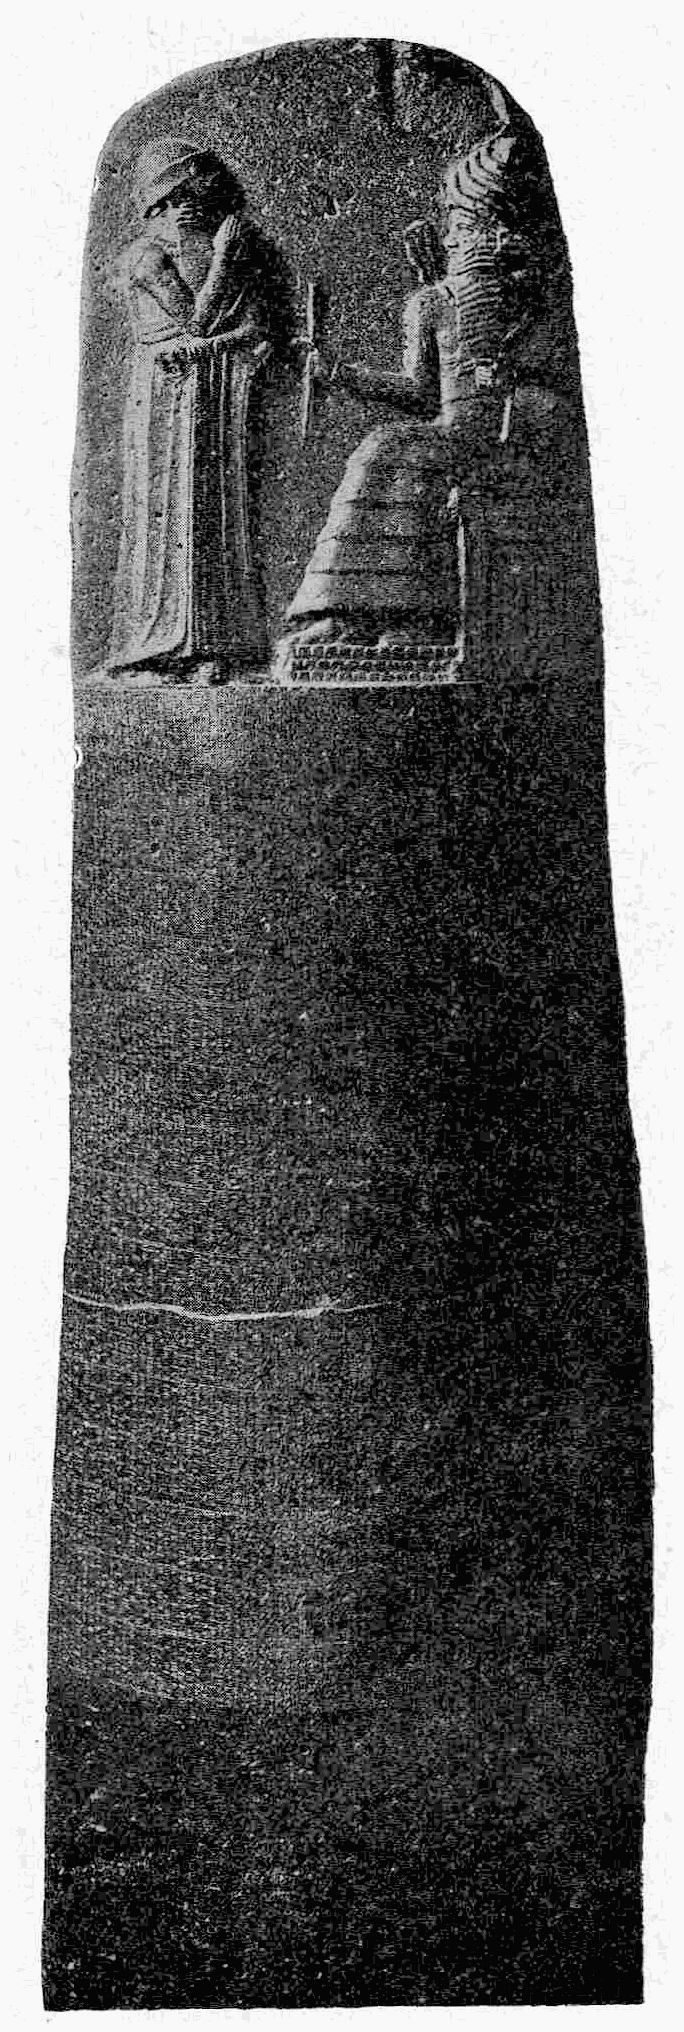 a description of the brief on the code of hammurabi No description by brooke arthur on 19 september 2013 tweet comments (0 the stele of hammurabi code of hammurabi.